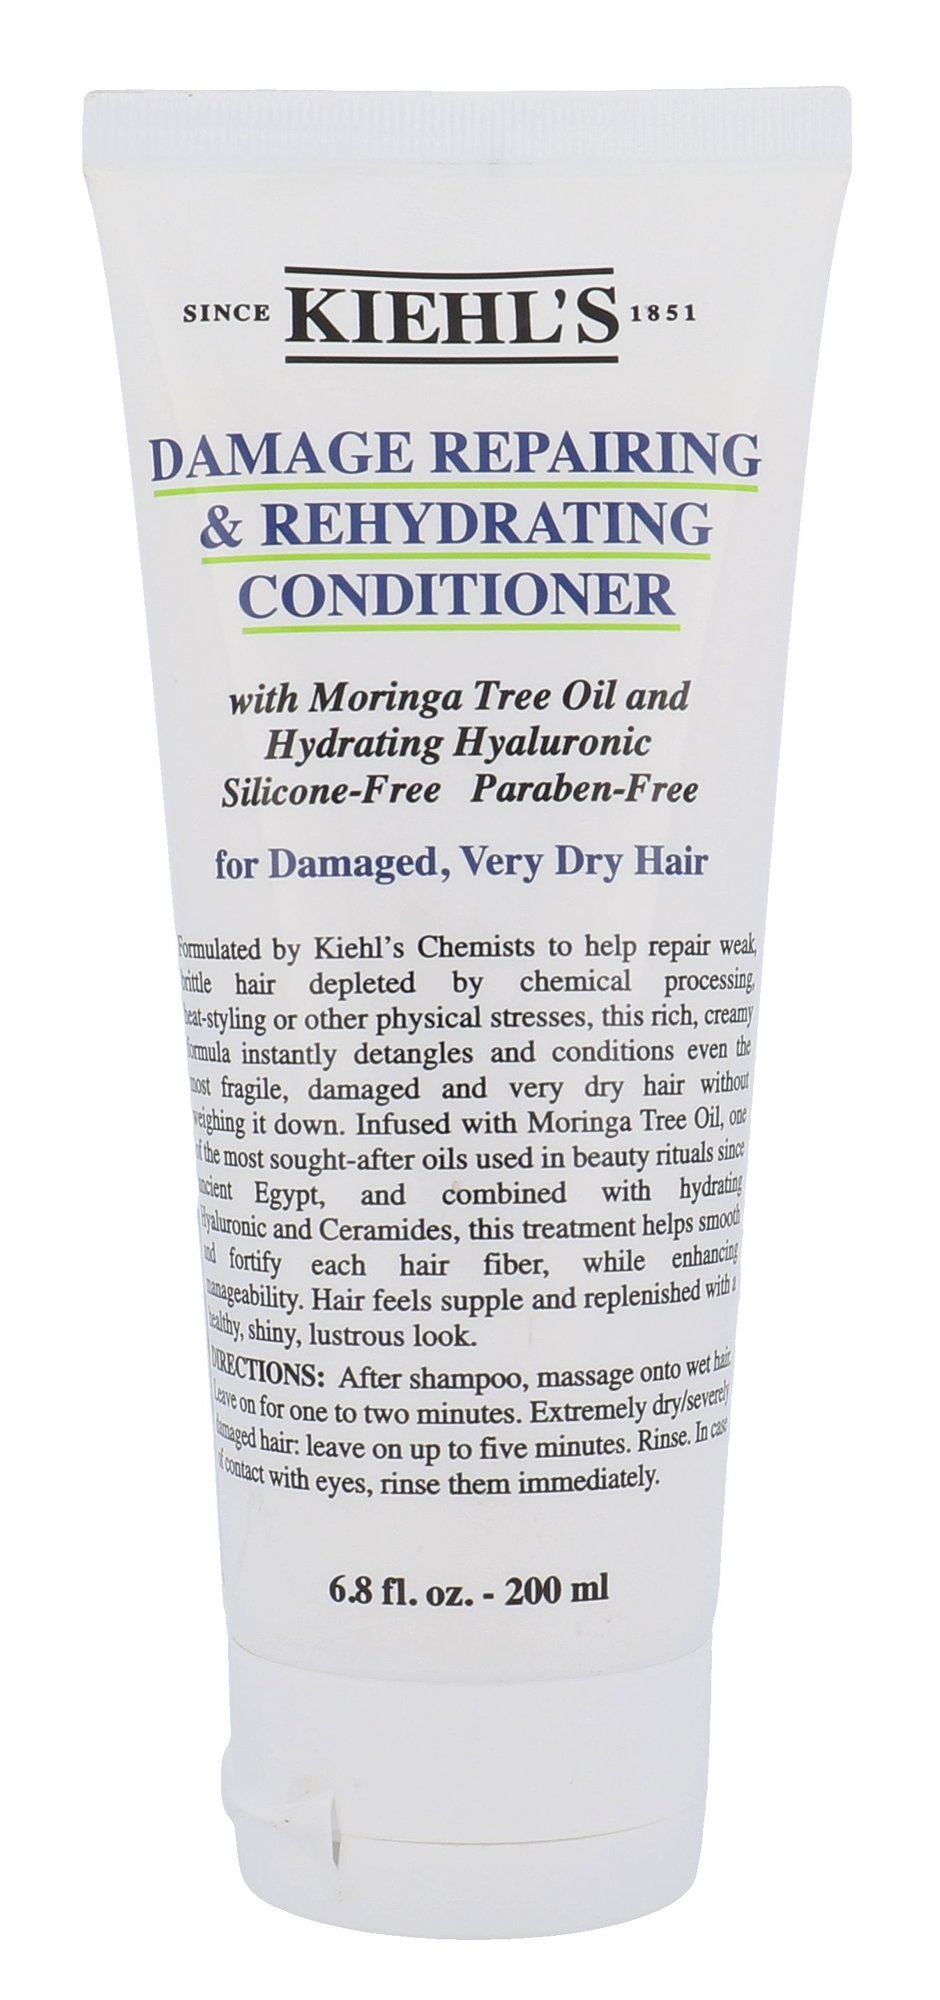 Kiehl´s Damage Repairing & Rehydrating Cosmetic 200ml